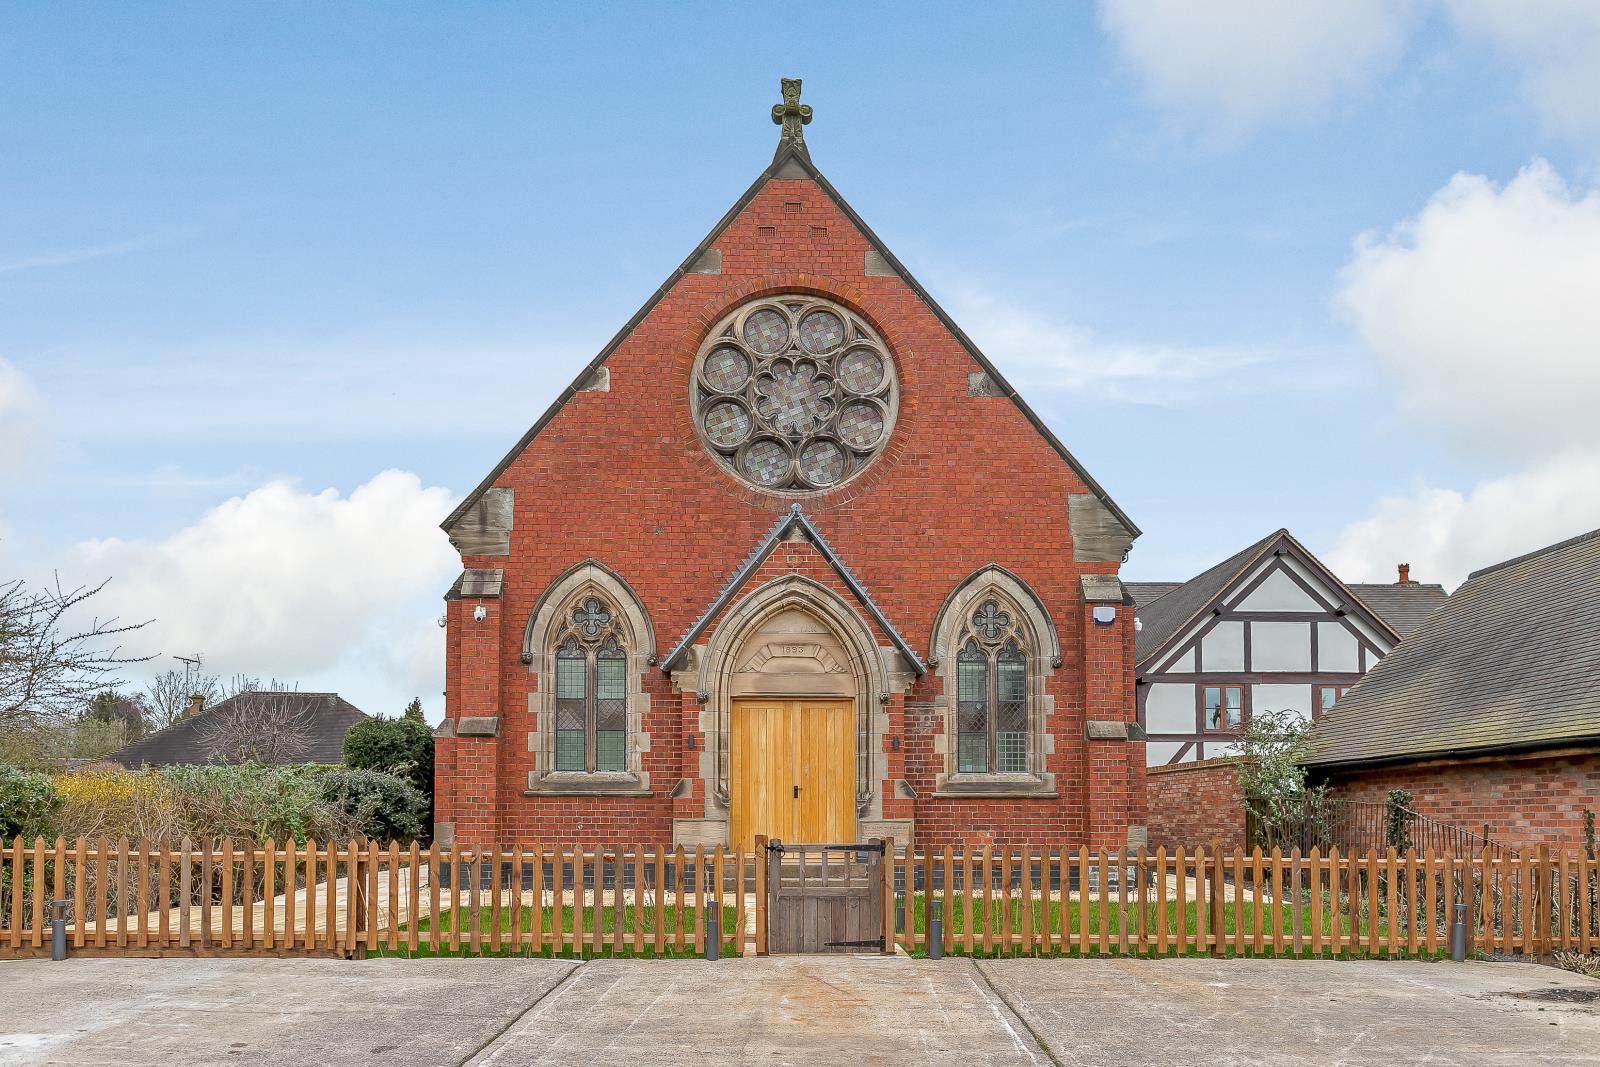 beautiful chapel church house conversion with ornate windows